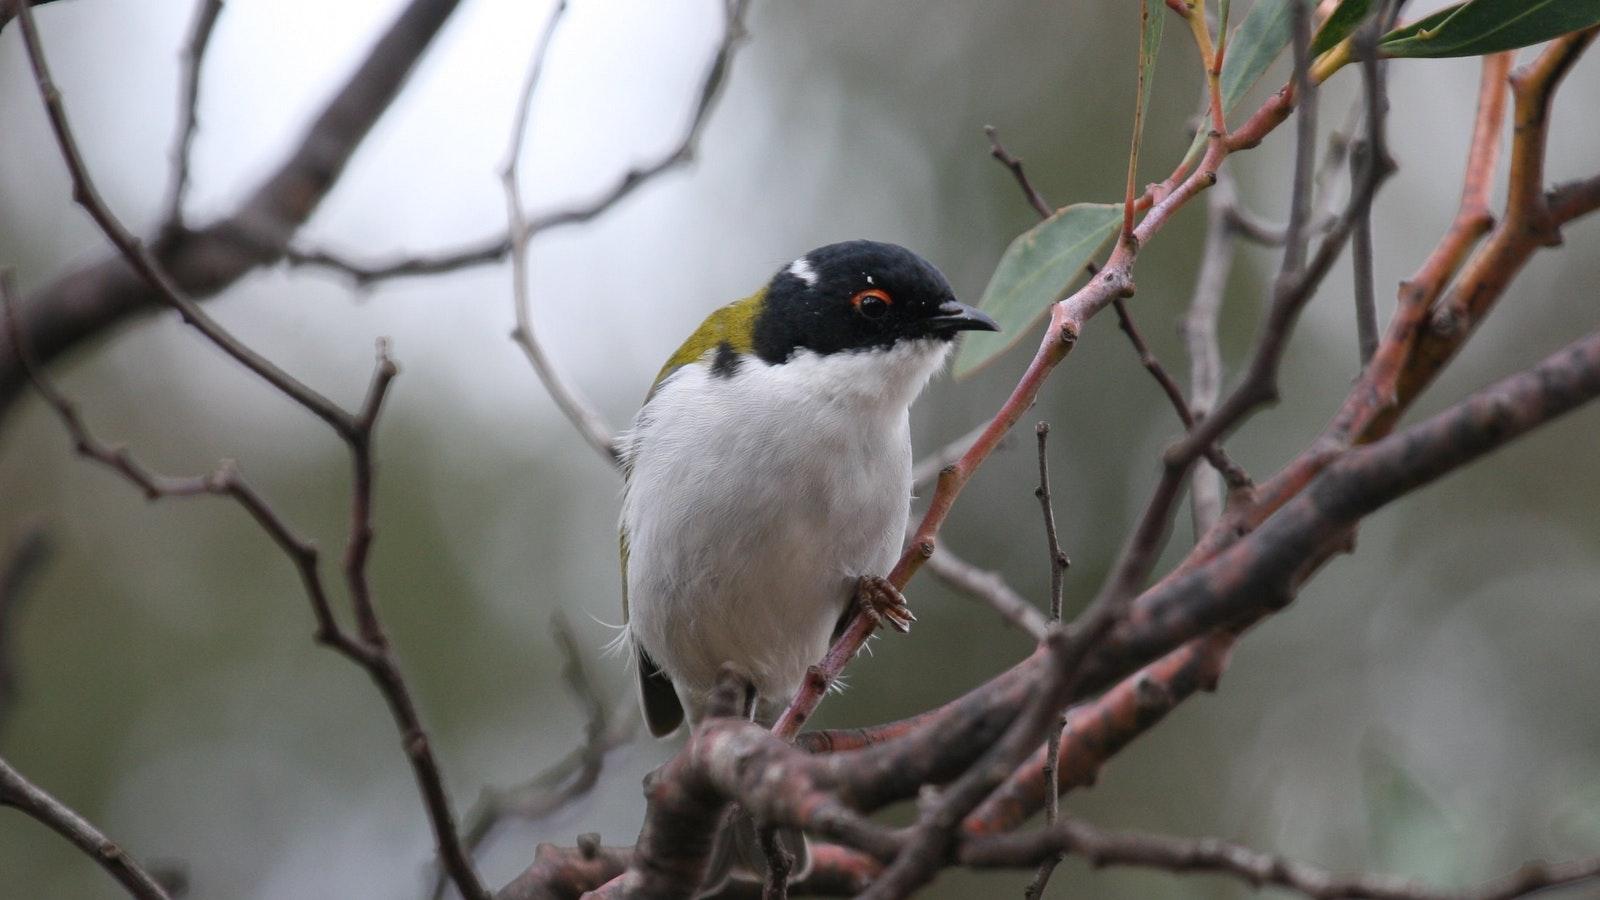 White-naped Honeyeater, a lovely bush bird